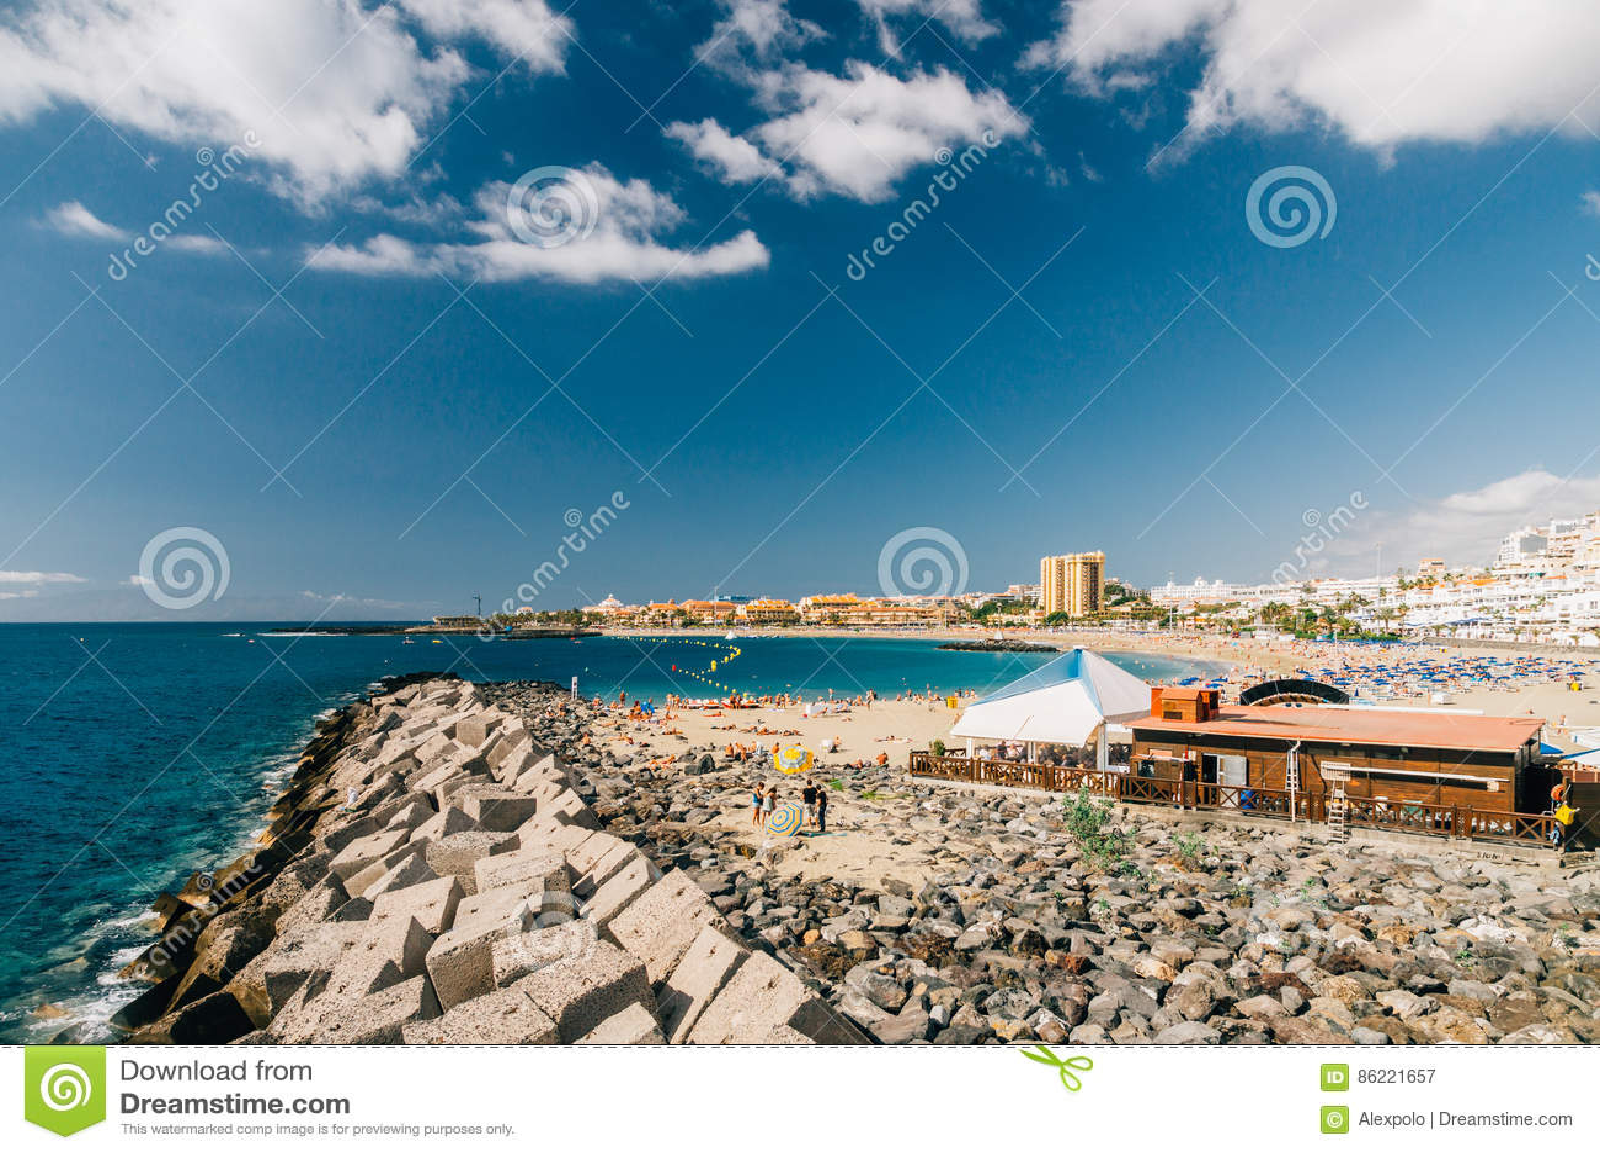 Multidão de turistas na praia de Playa de Las Vista